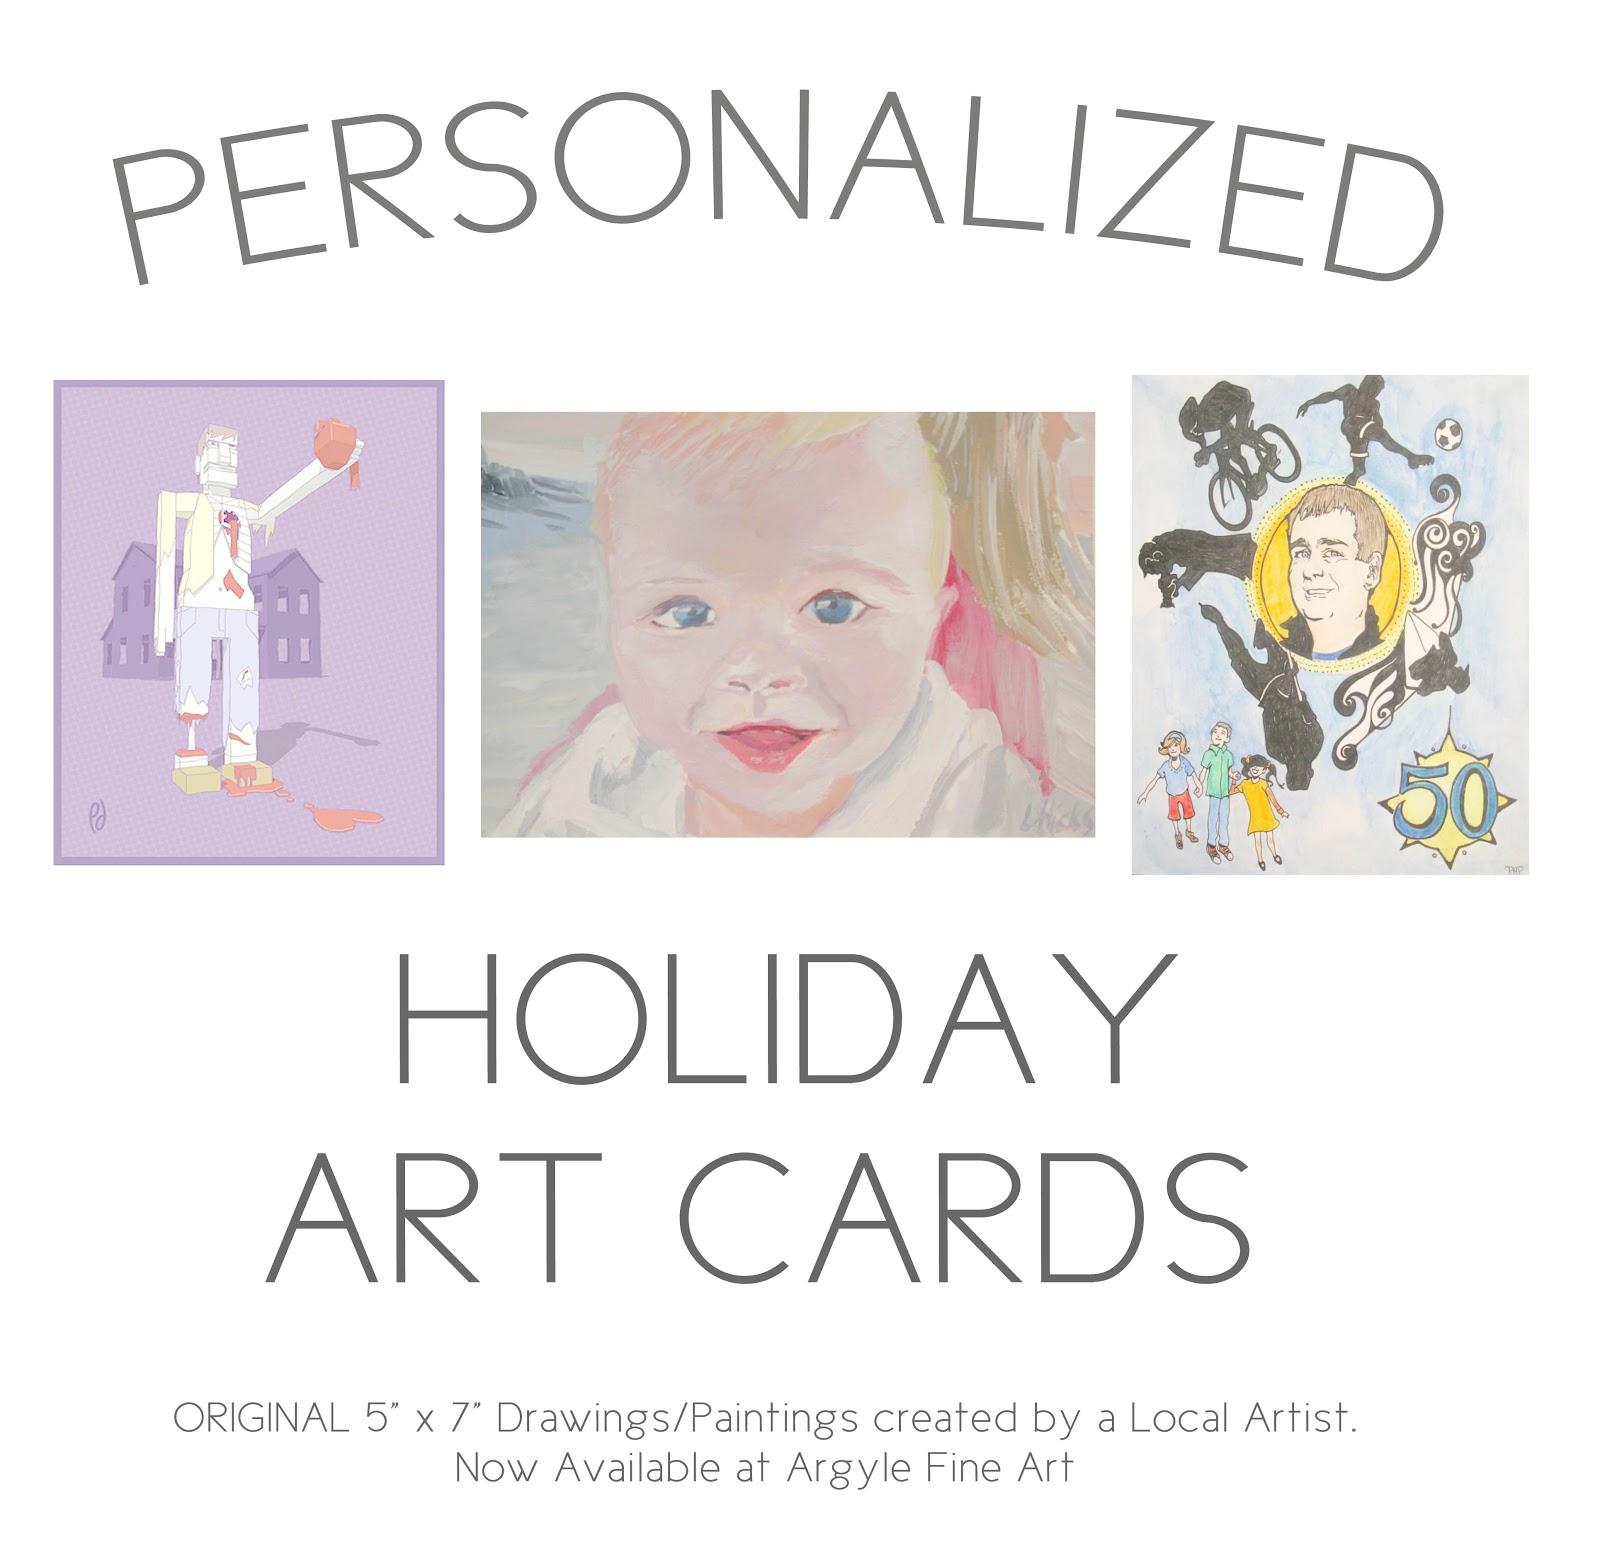 Argyle Fine Art: Personalized Holiday Cards!